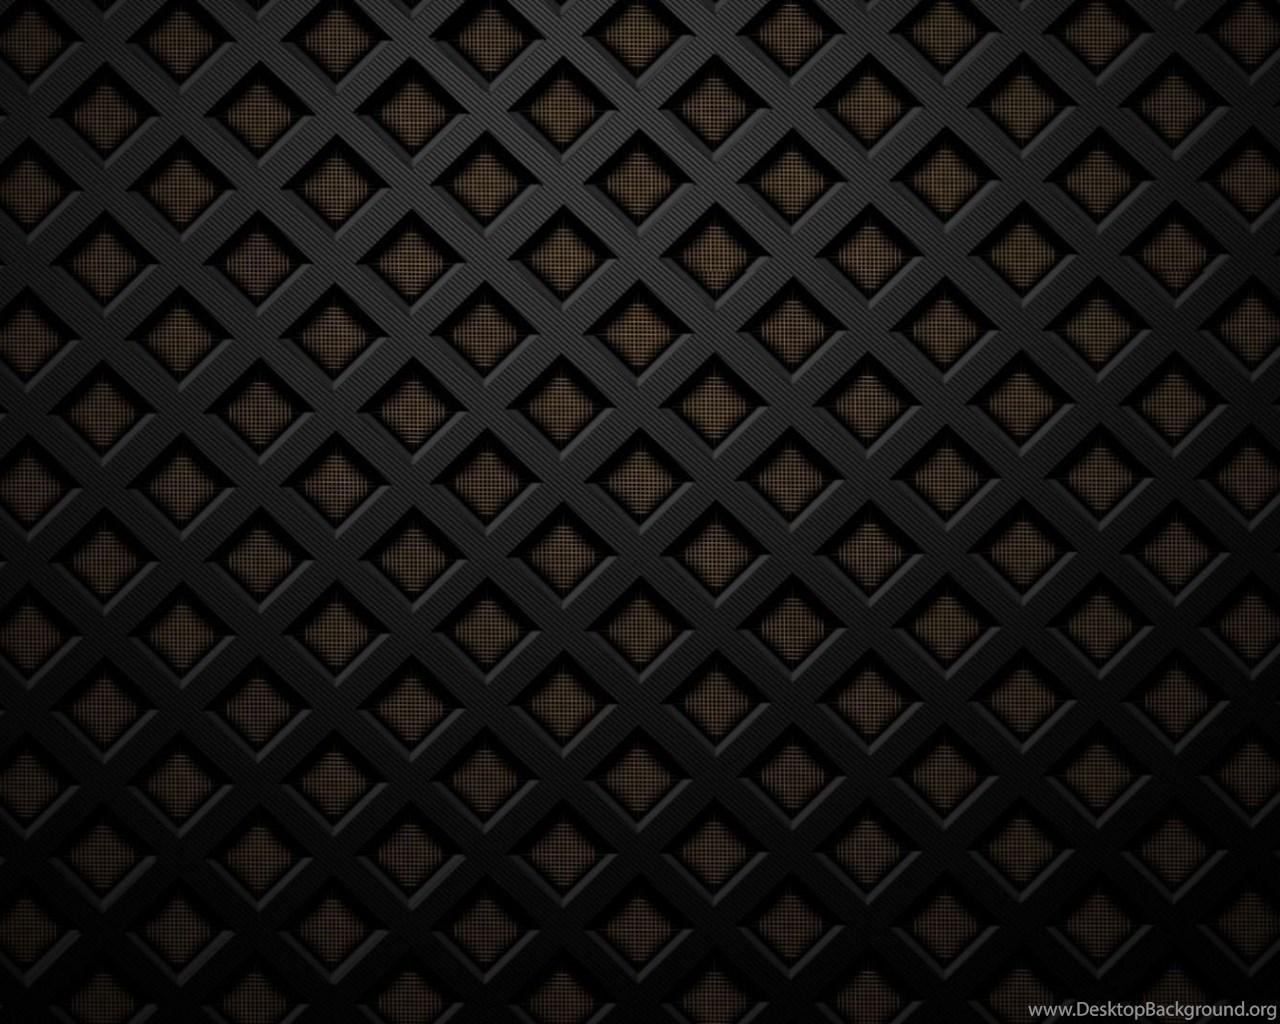 Black Texture Free Download Hd Wallpapers 1014 Hd Wallpapers Site Desktop Background